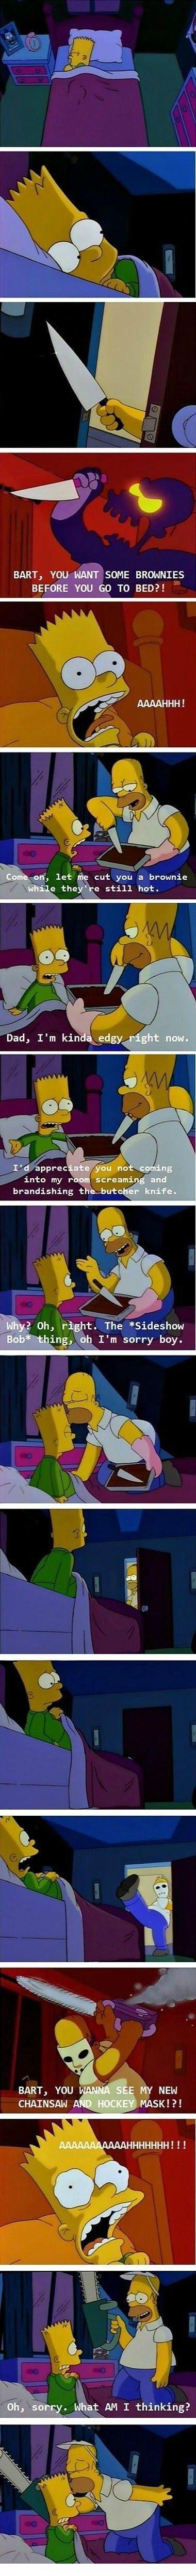 I remember that episode